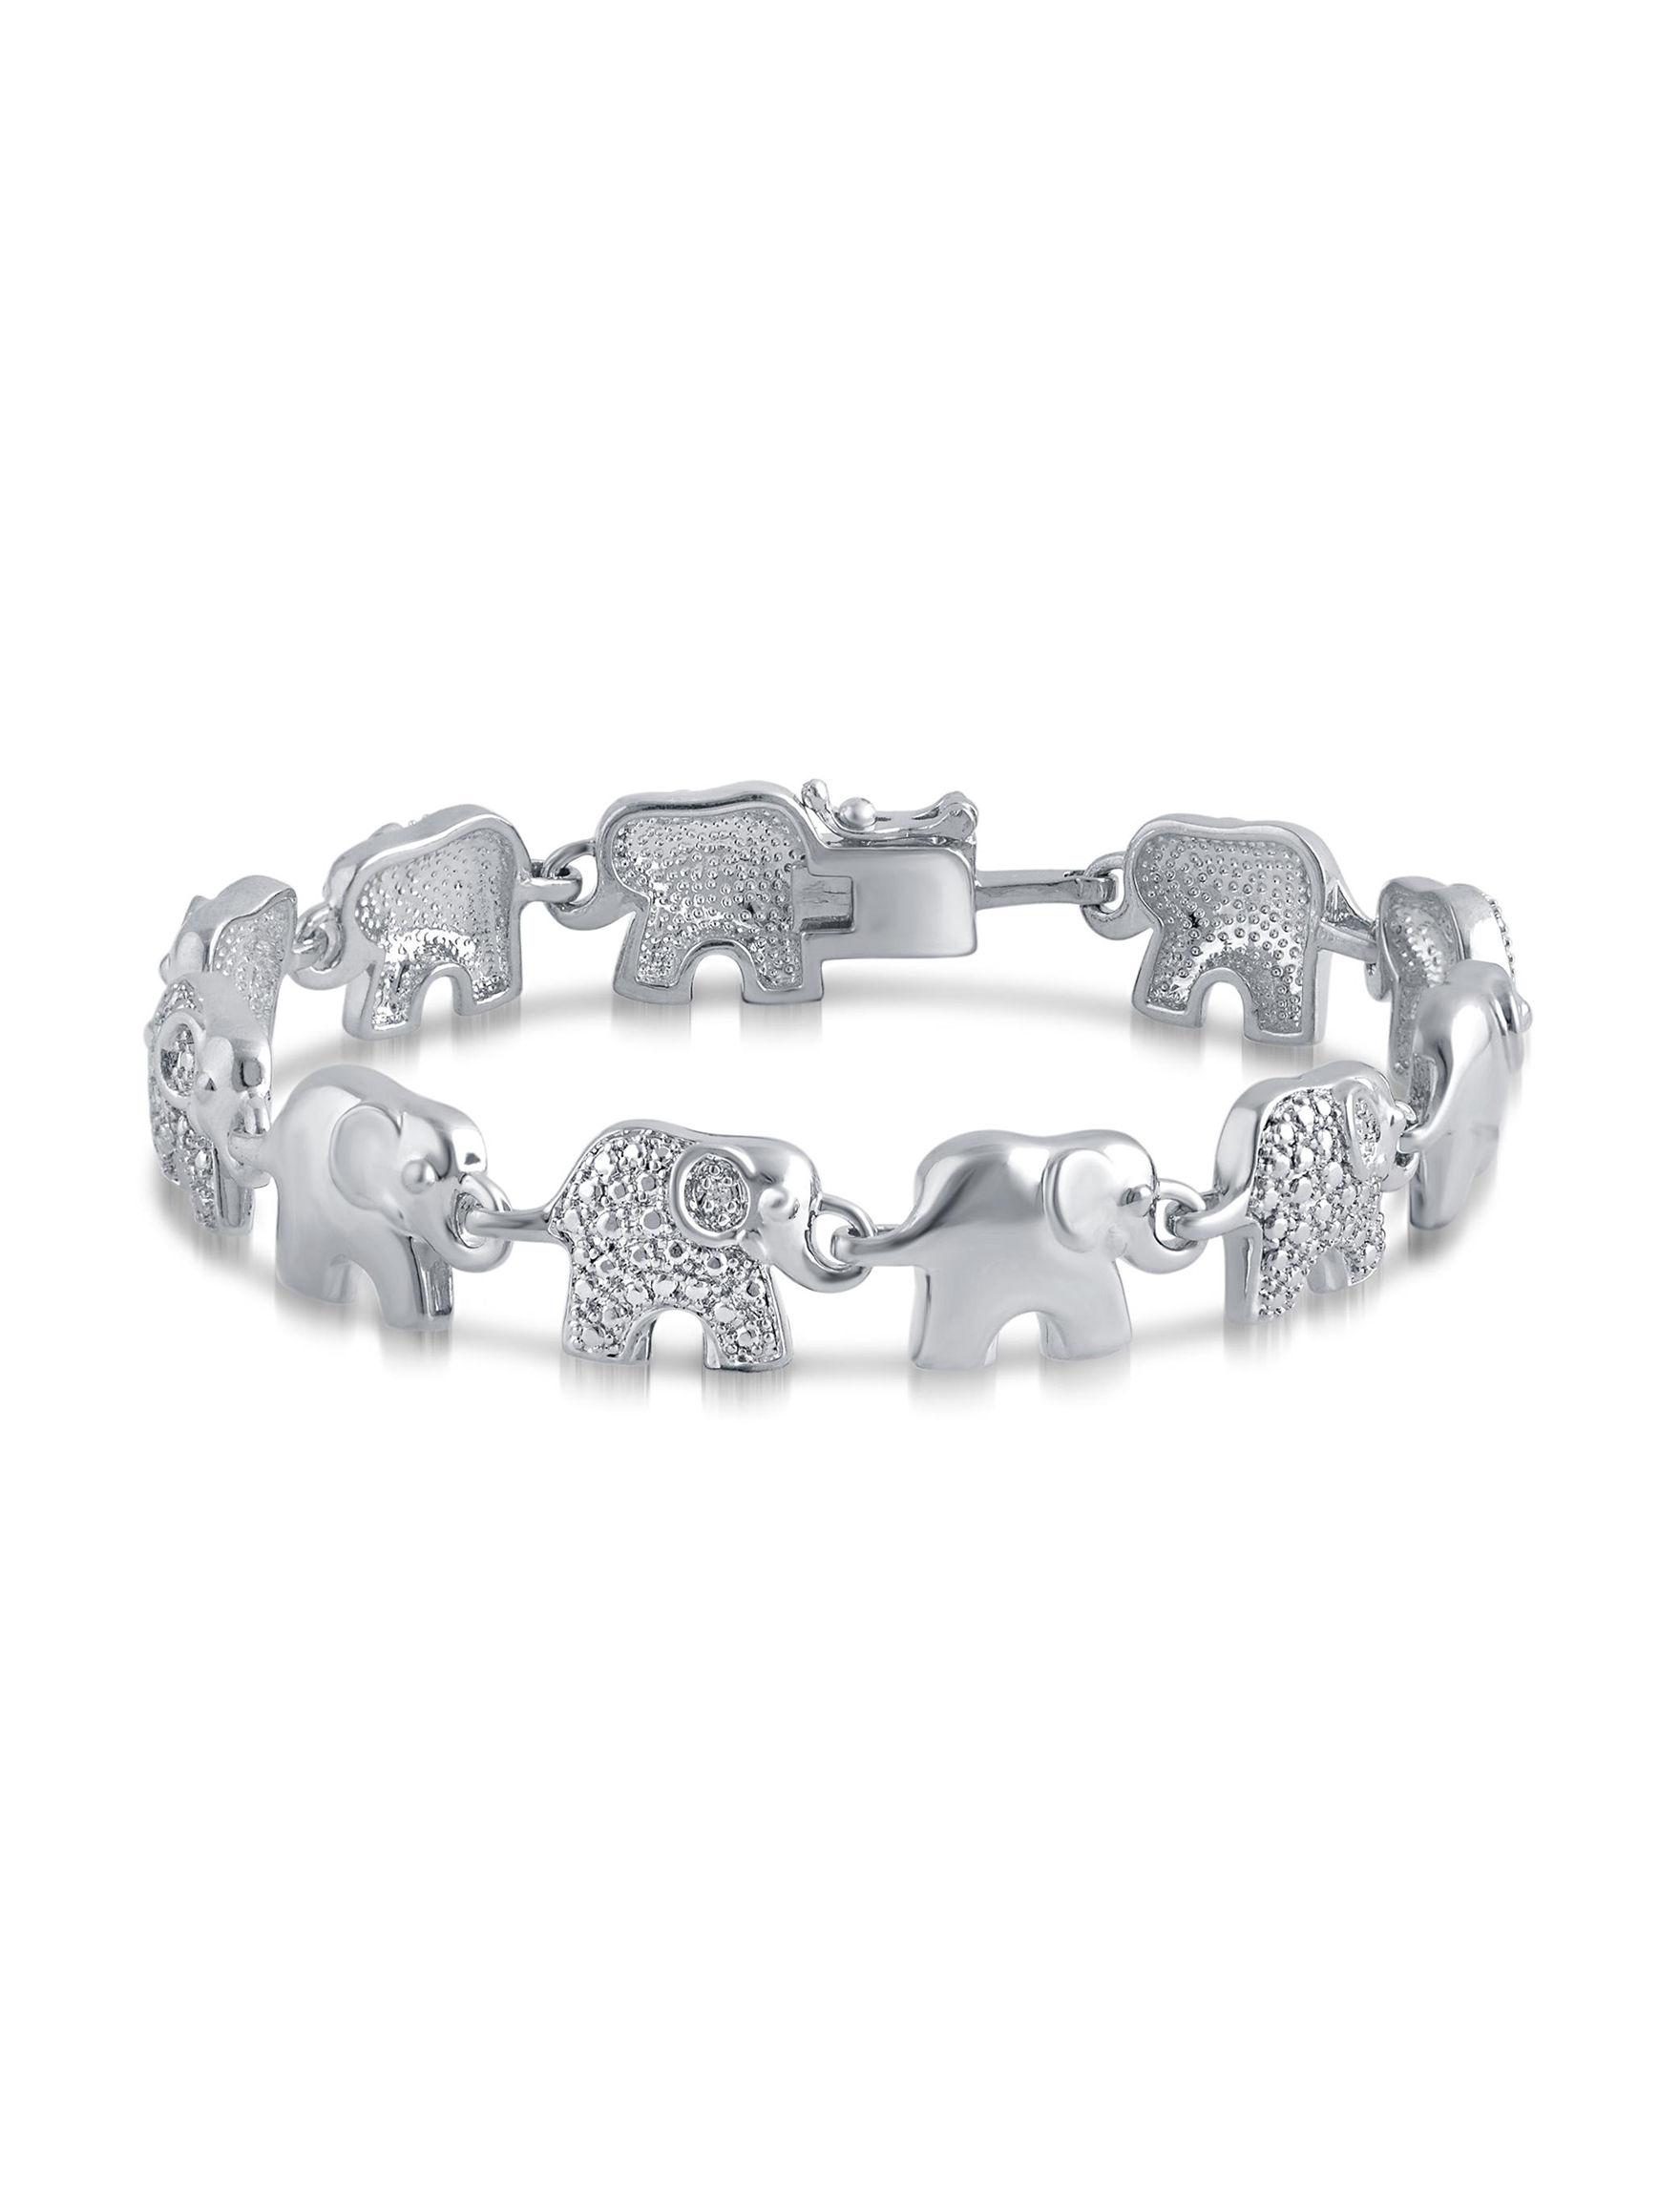 Brilliant Diamond White Gold Bracelets Fine Jewelry